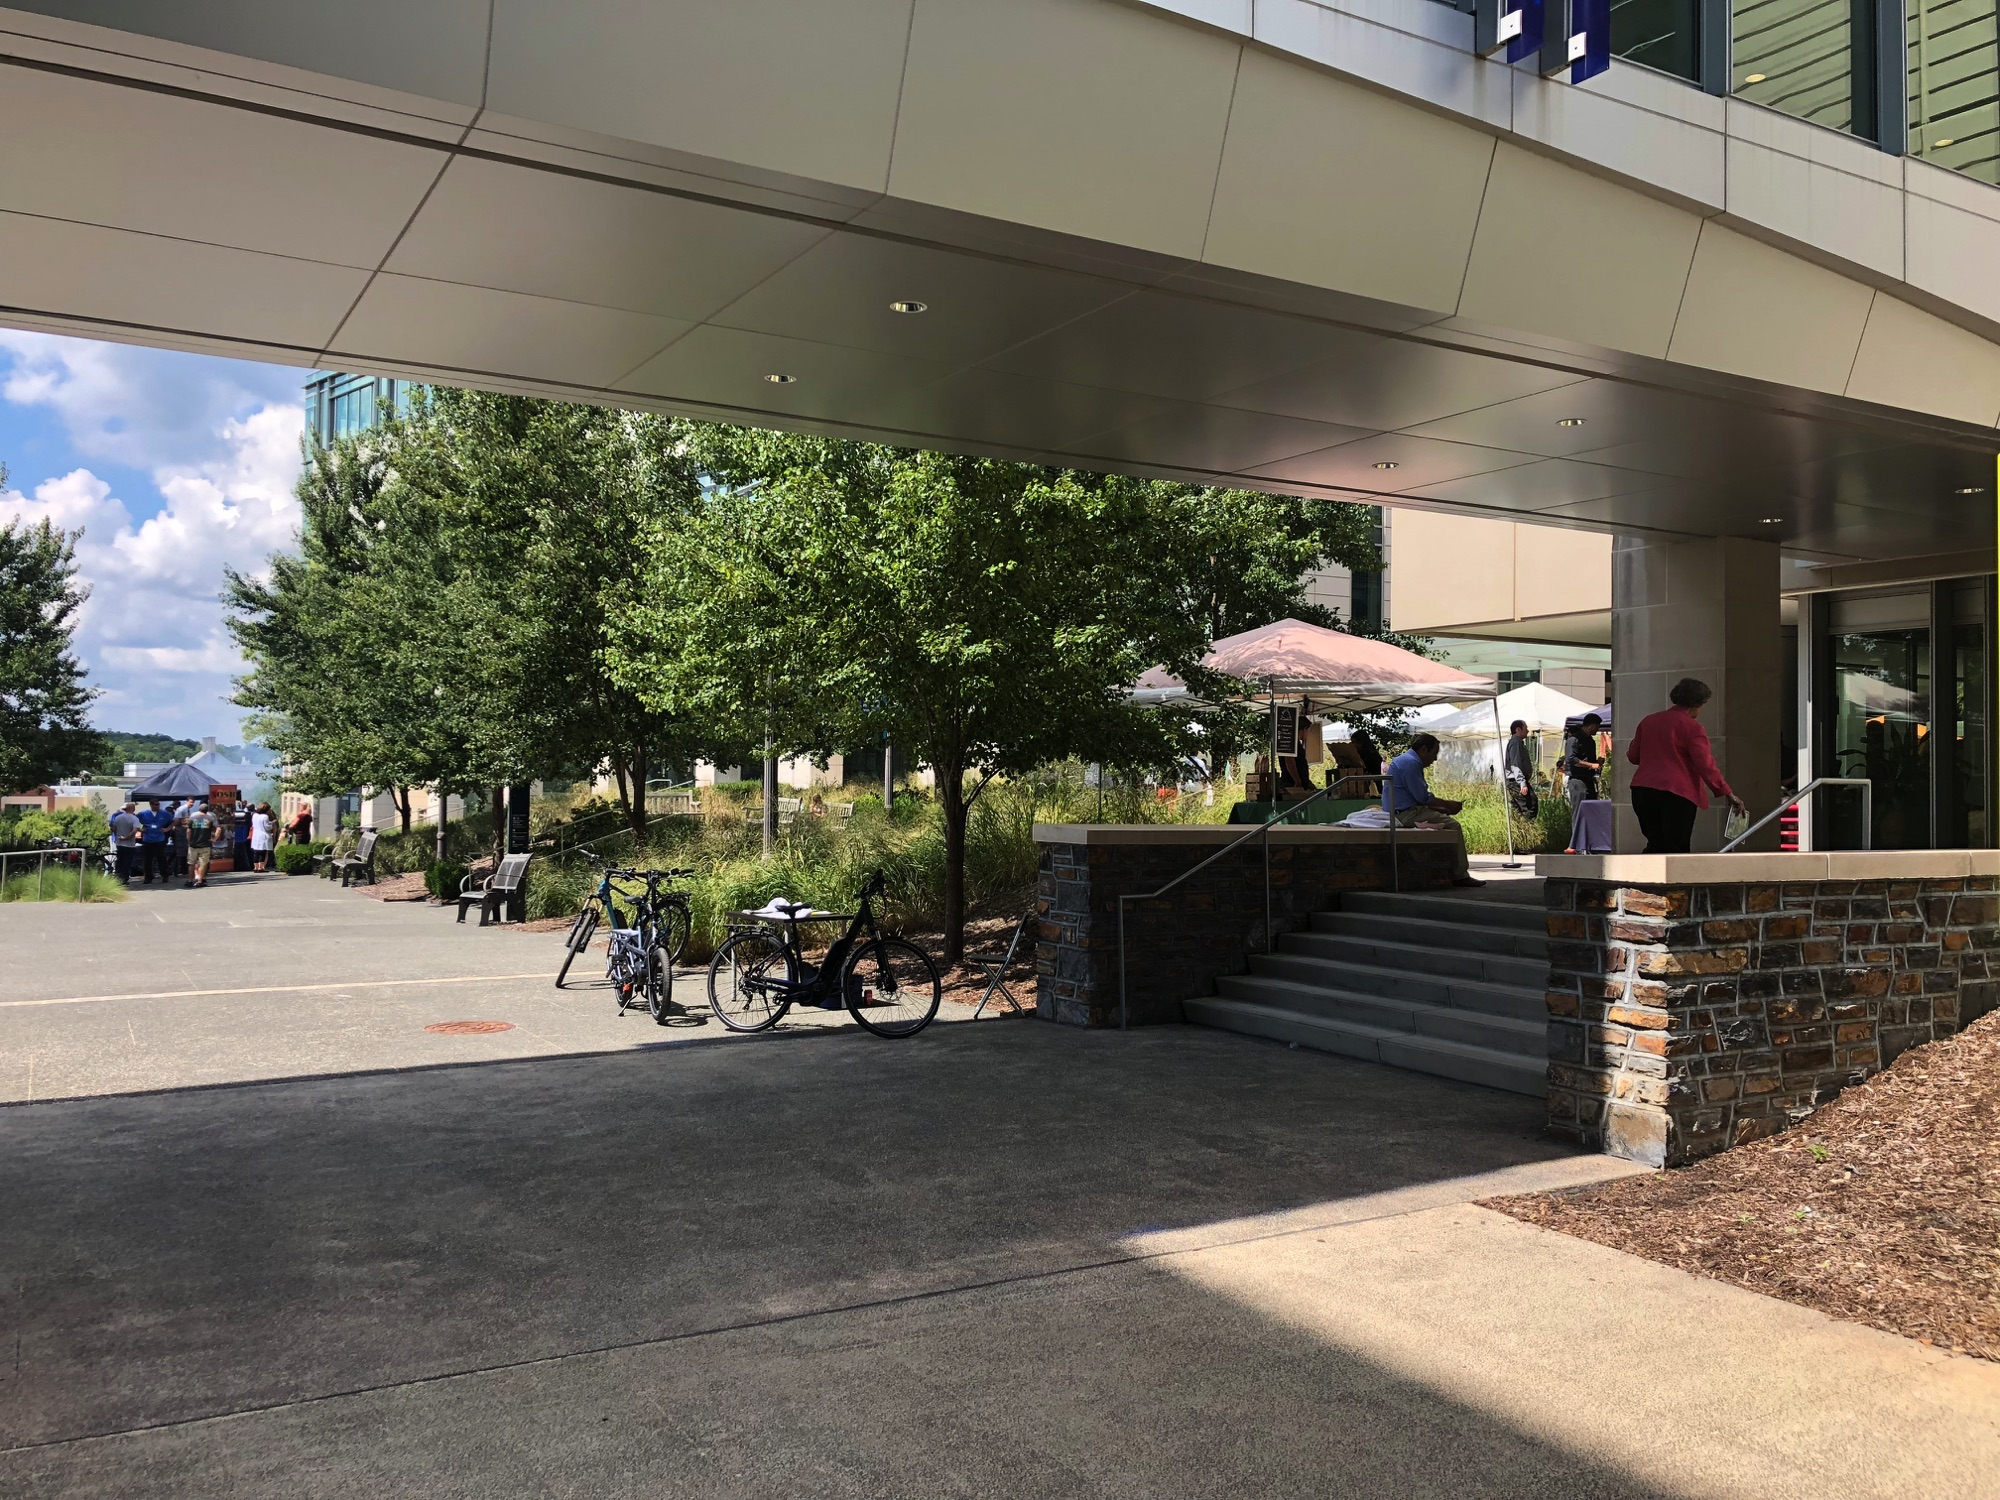 eBike Central at Duke University in Durham NC